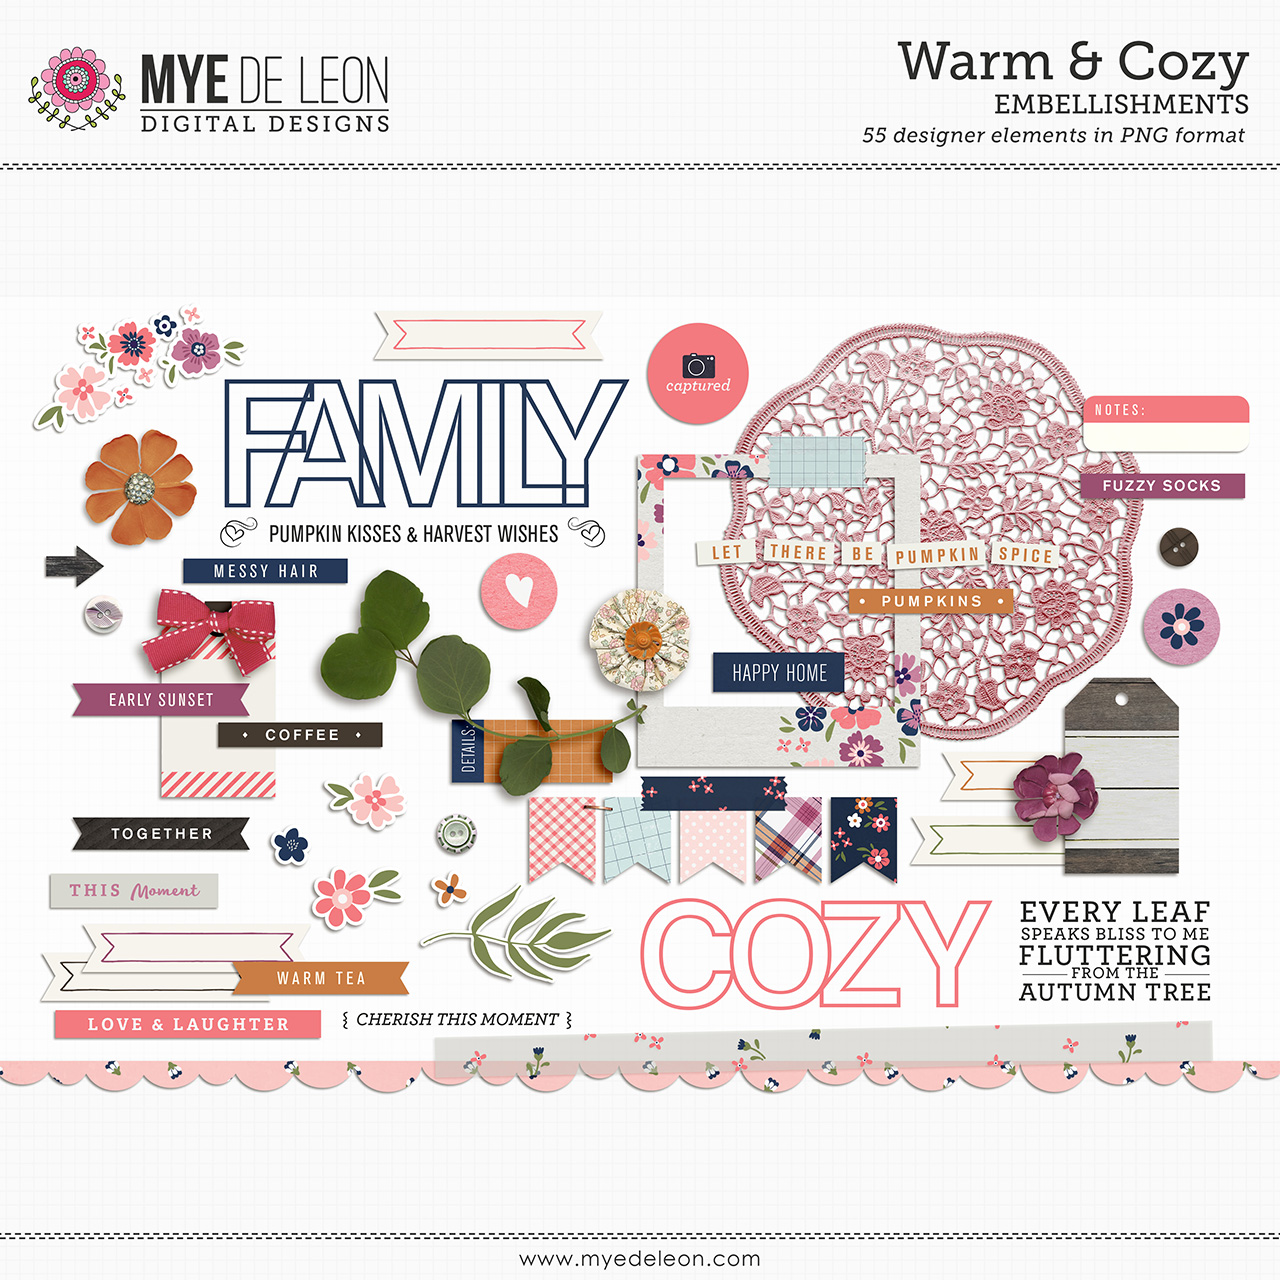 Warm & Cozy | Embellishments